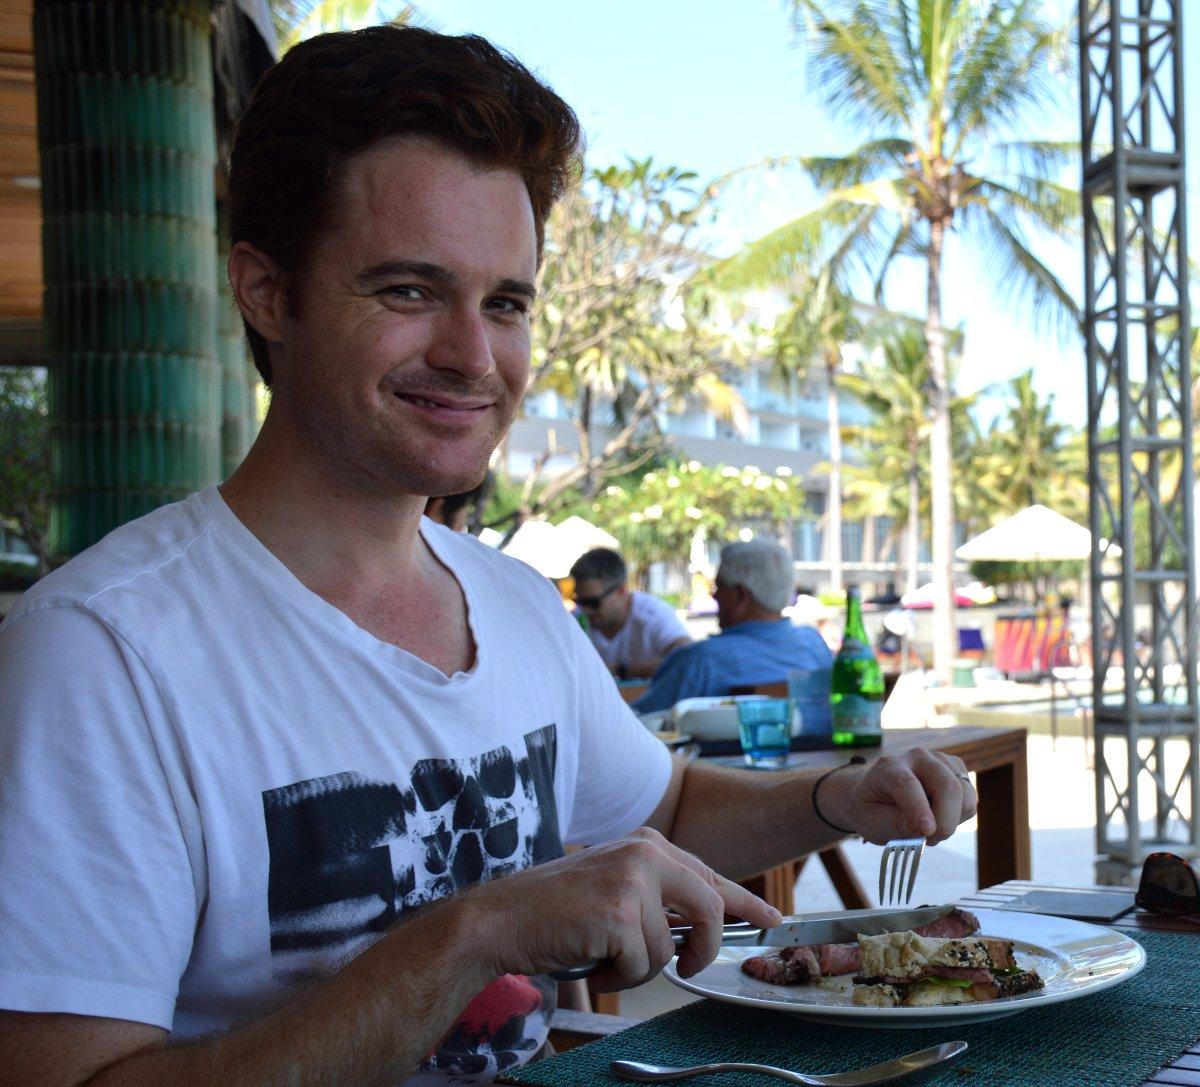 W Retreat Sunday Brunch Bali Double-Barrelled Travel